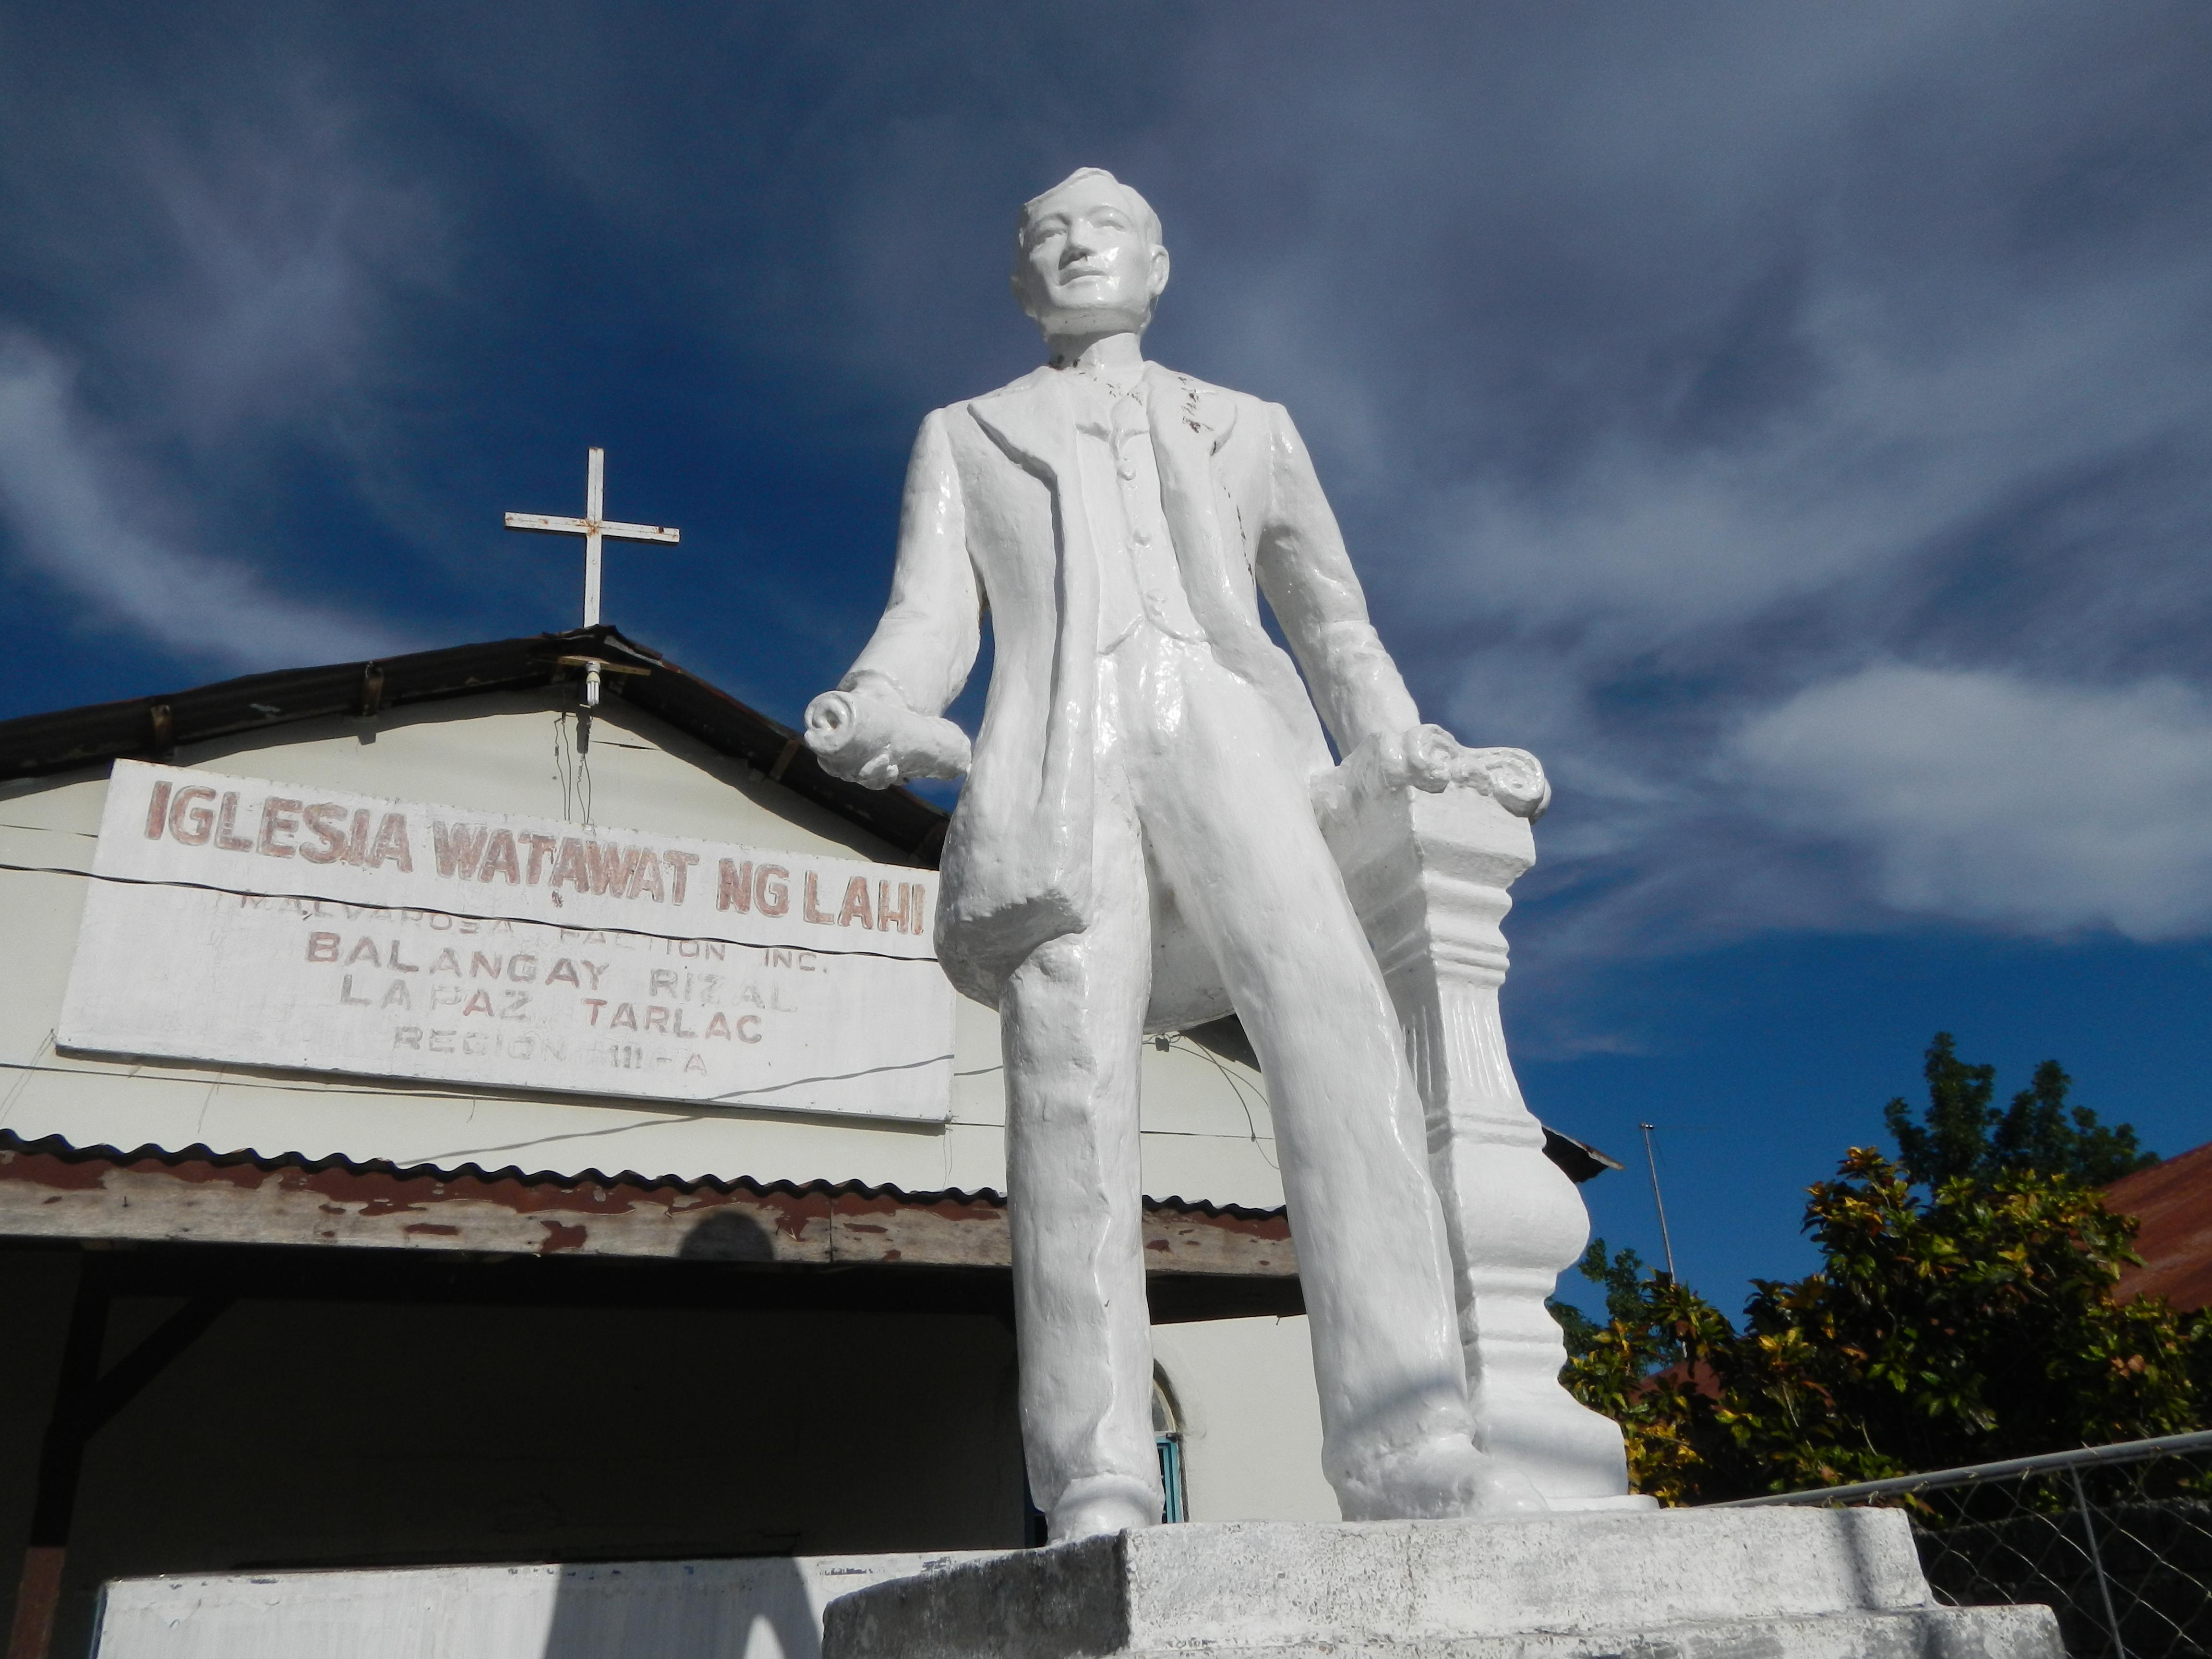 File:7605jfRizal Balanoy La Paz Hall Roads Tarlacfvf 08 ...